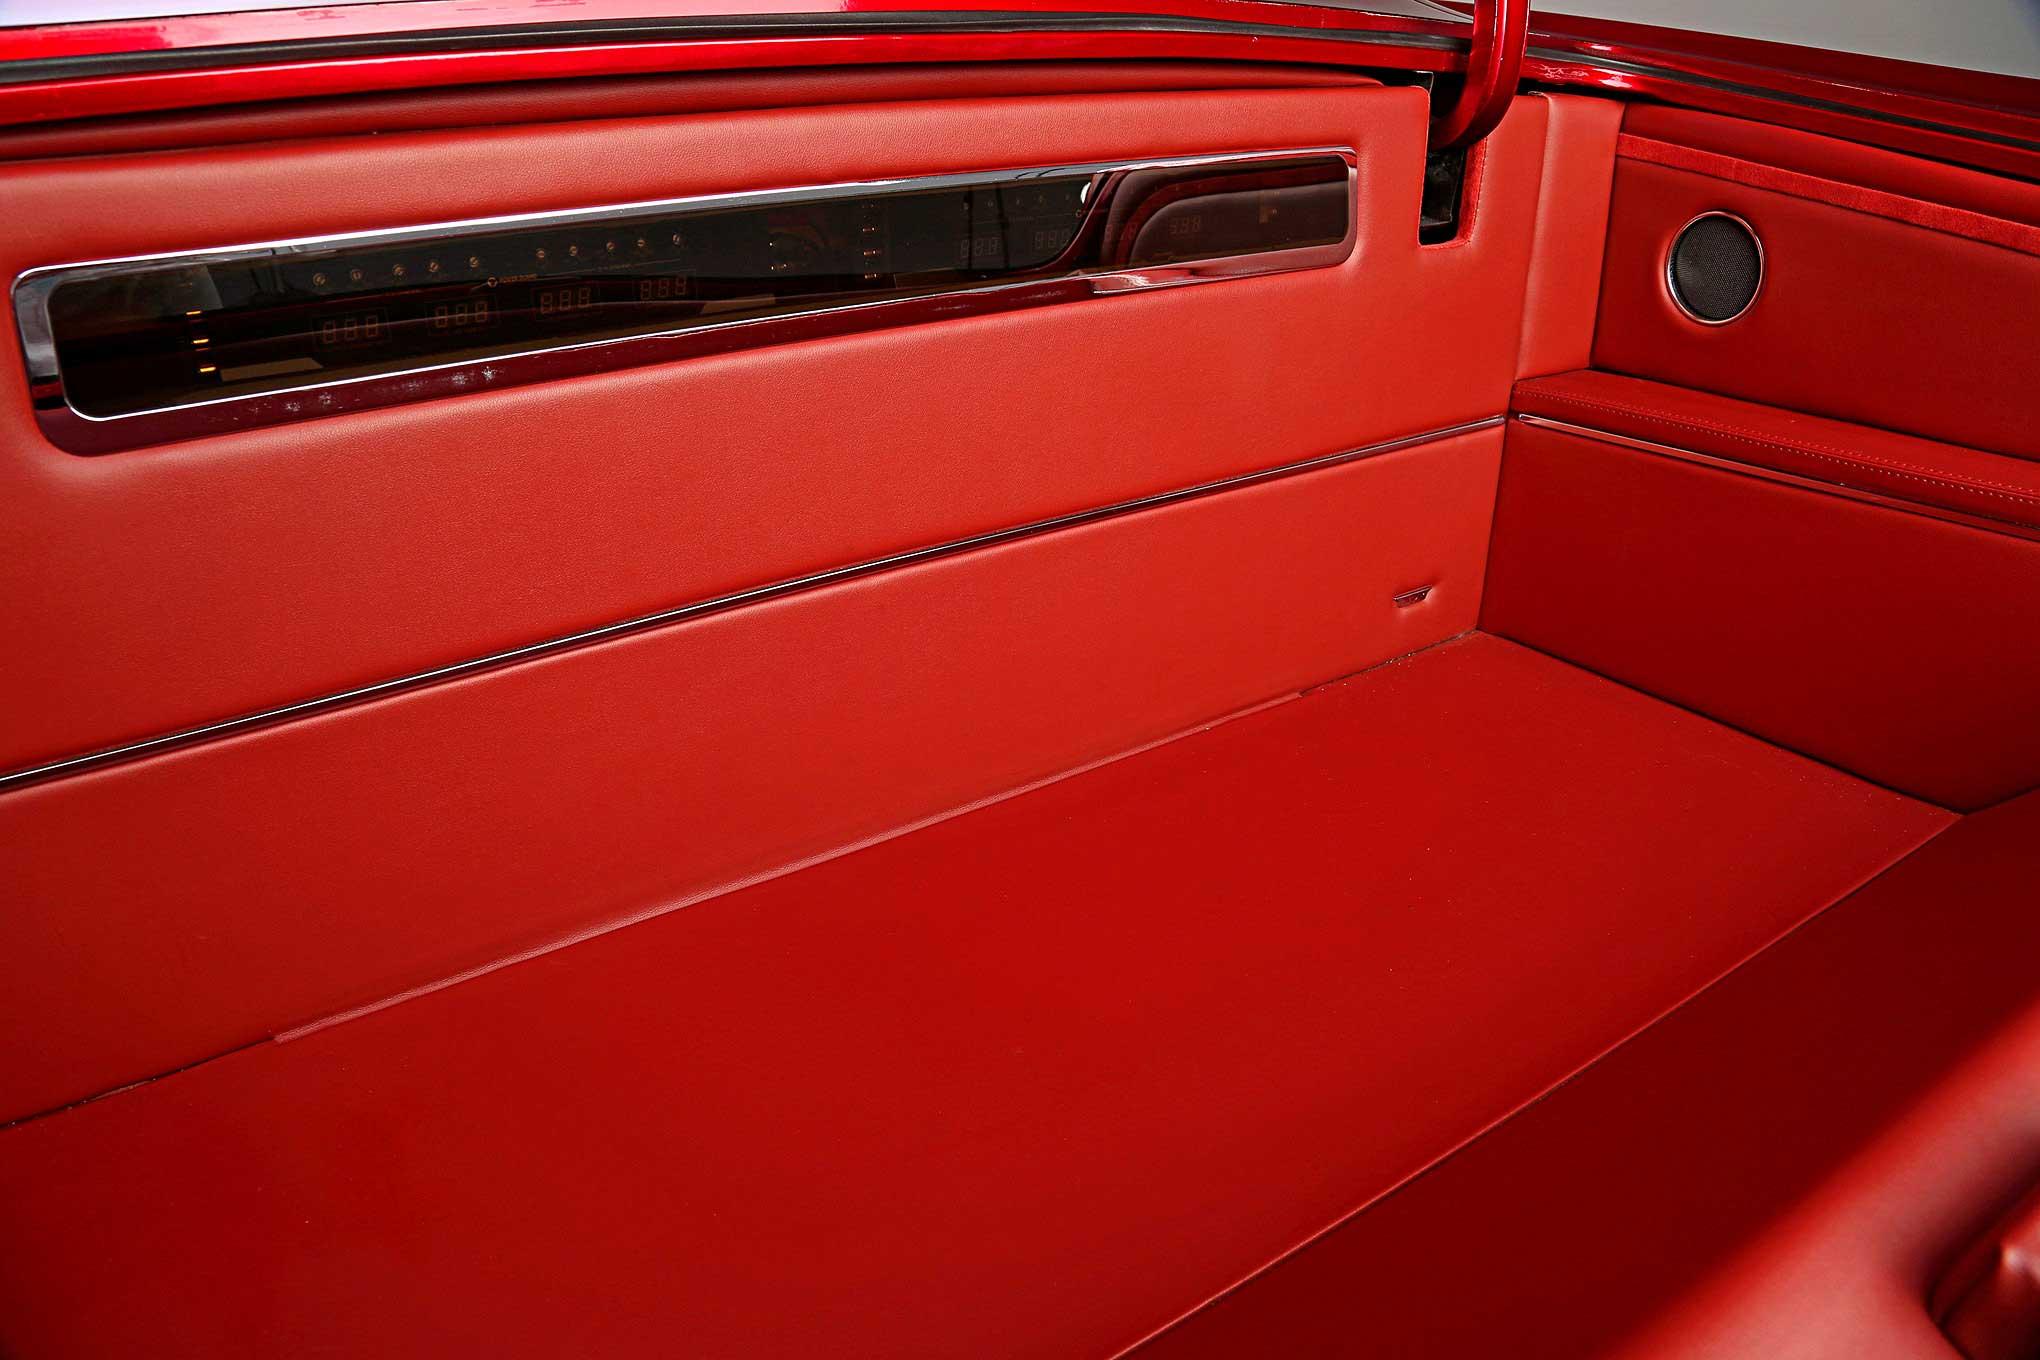 1965 Chevrolet Impala Custom Trunk Panels Lowrider